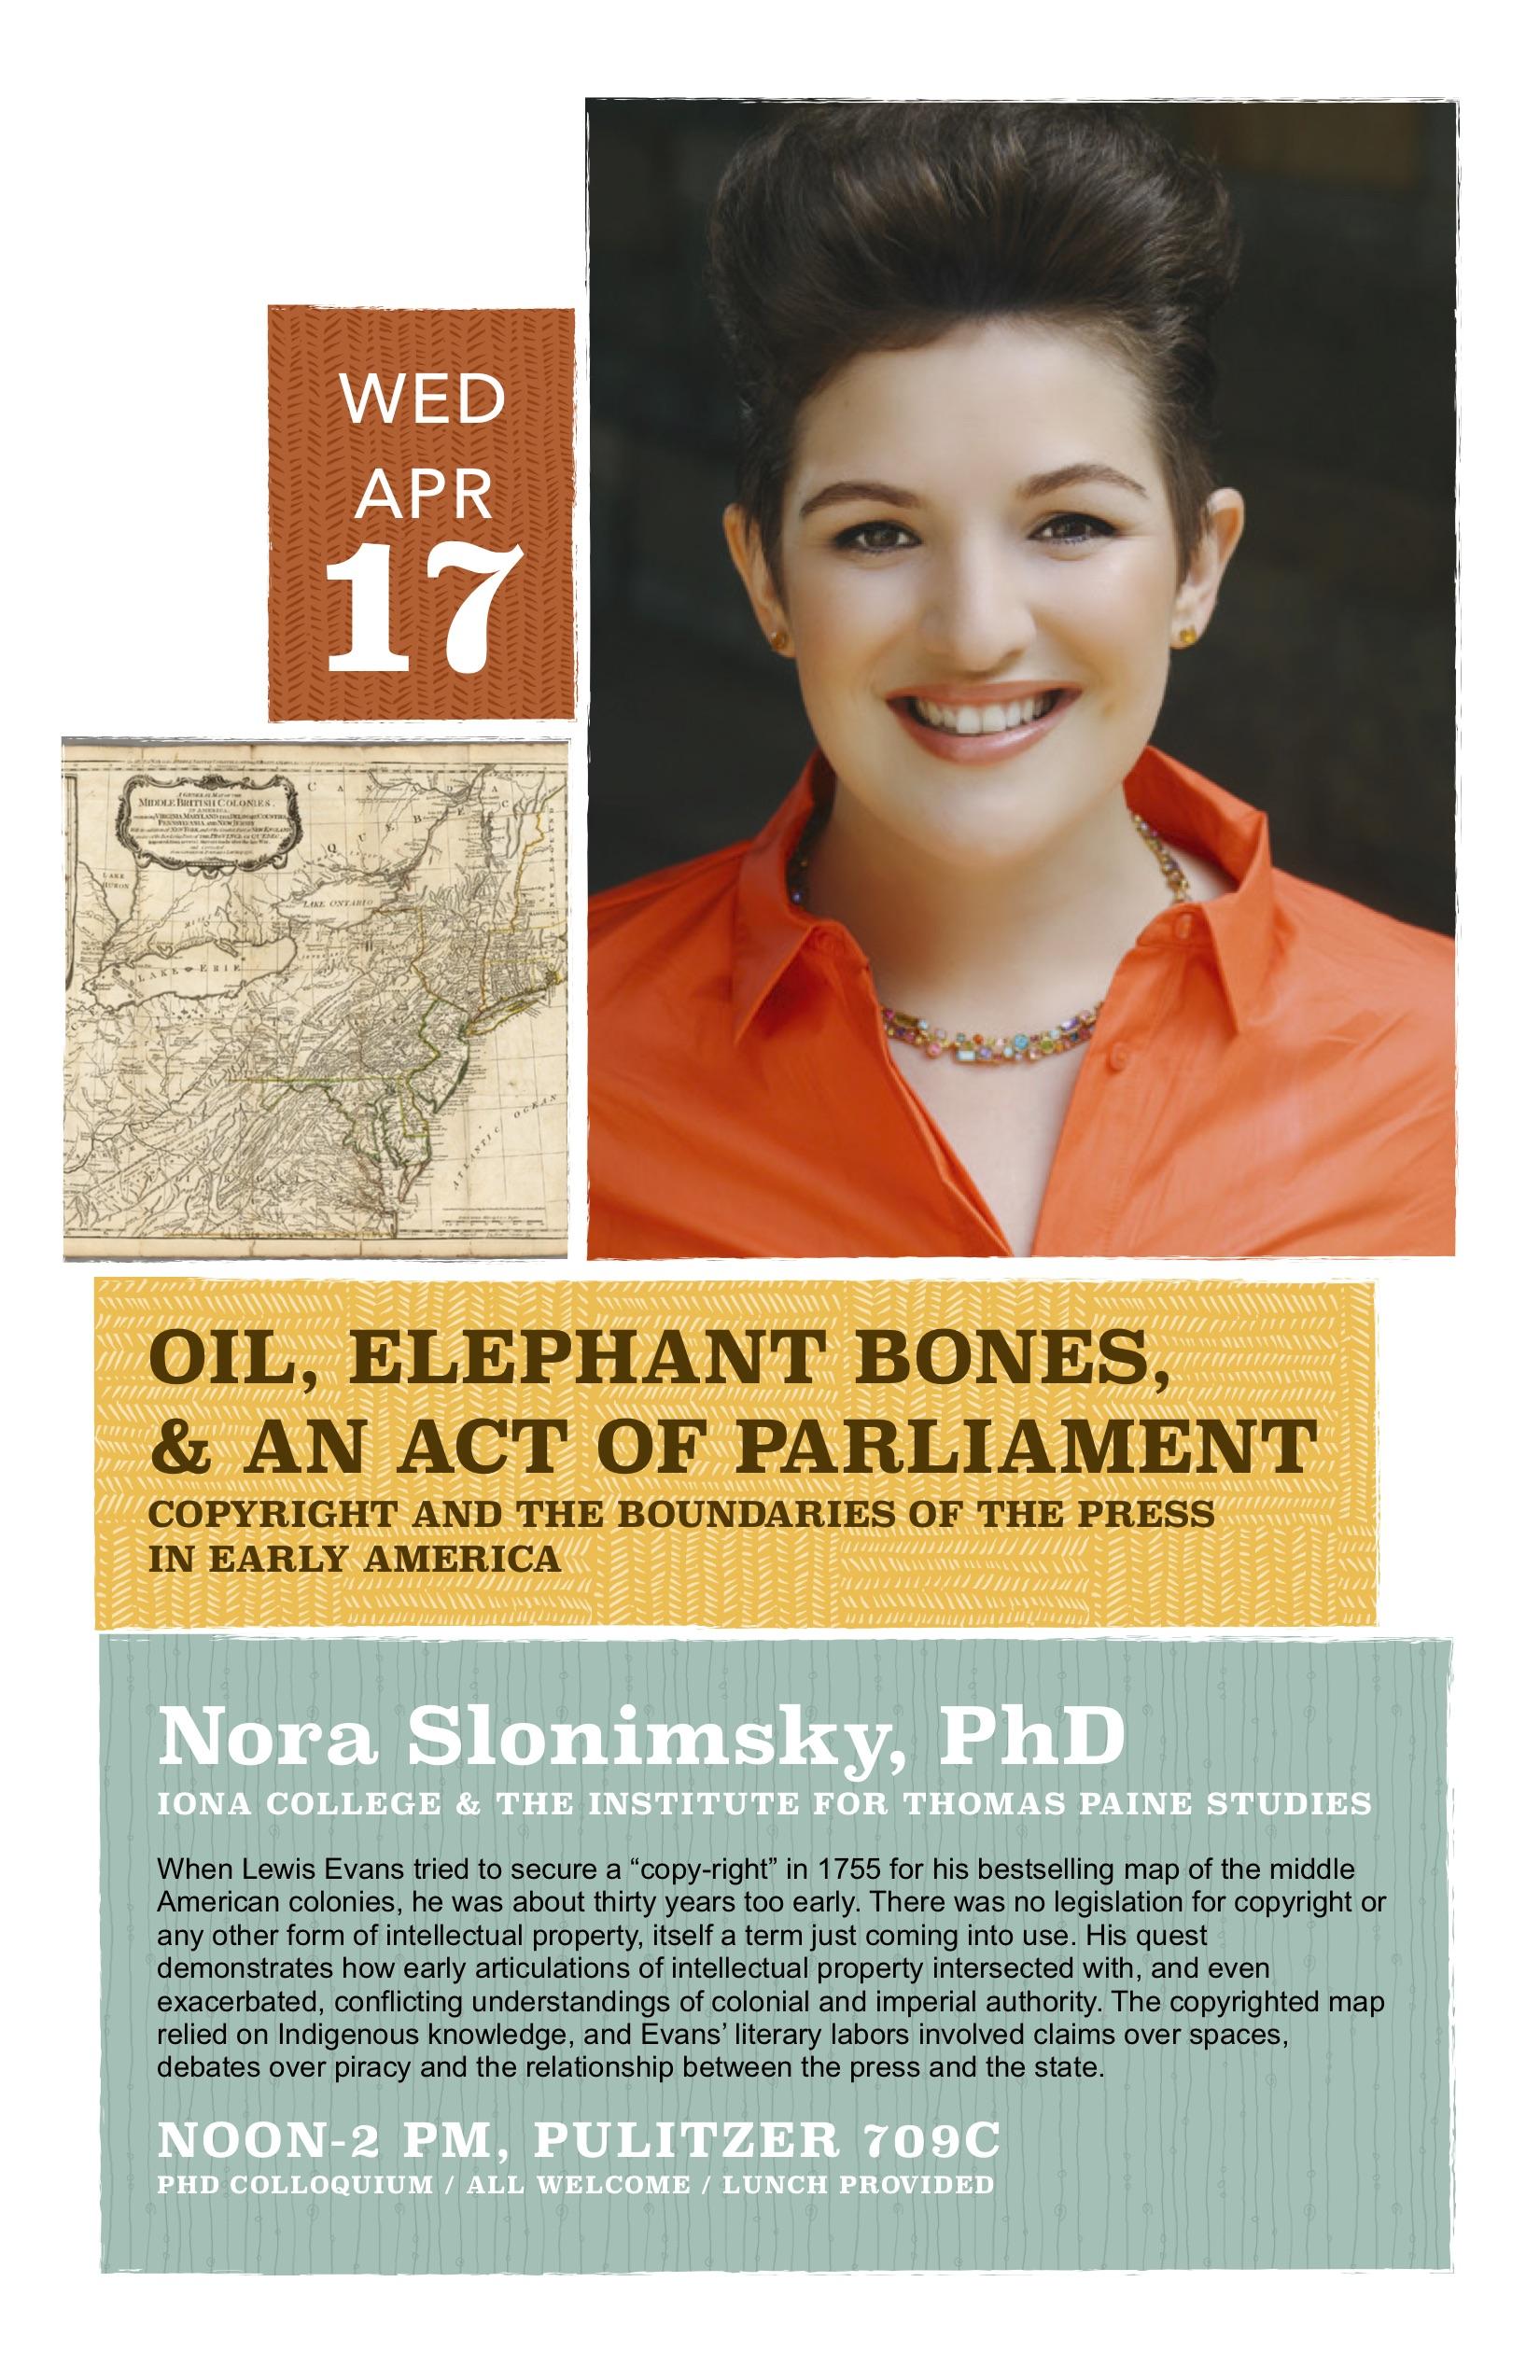 Nora Slonimsky 11 x 17.jpg